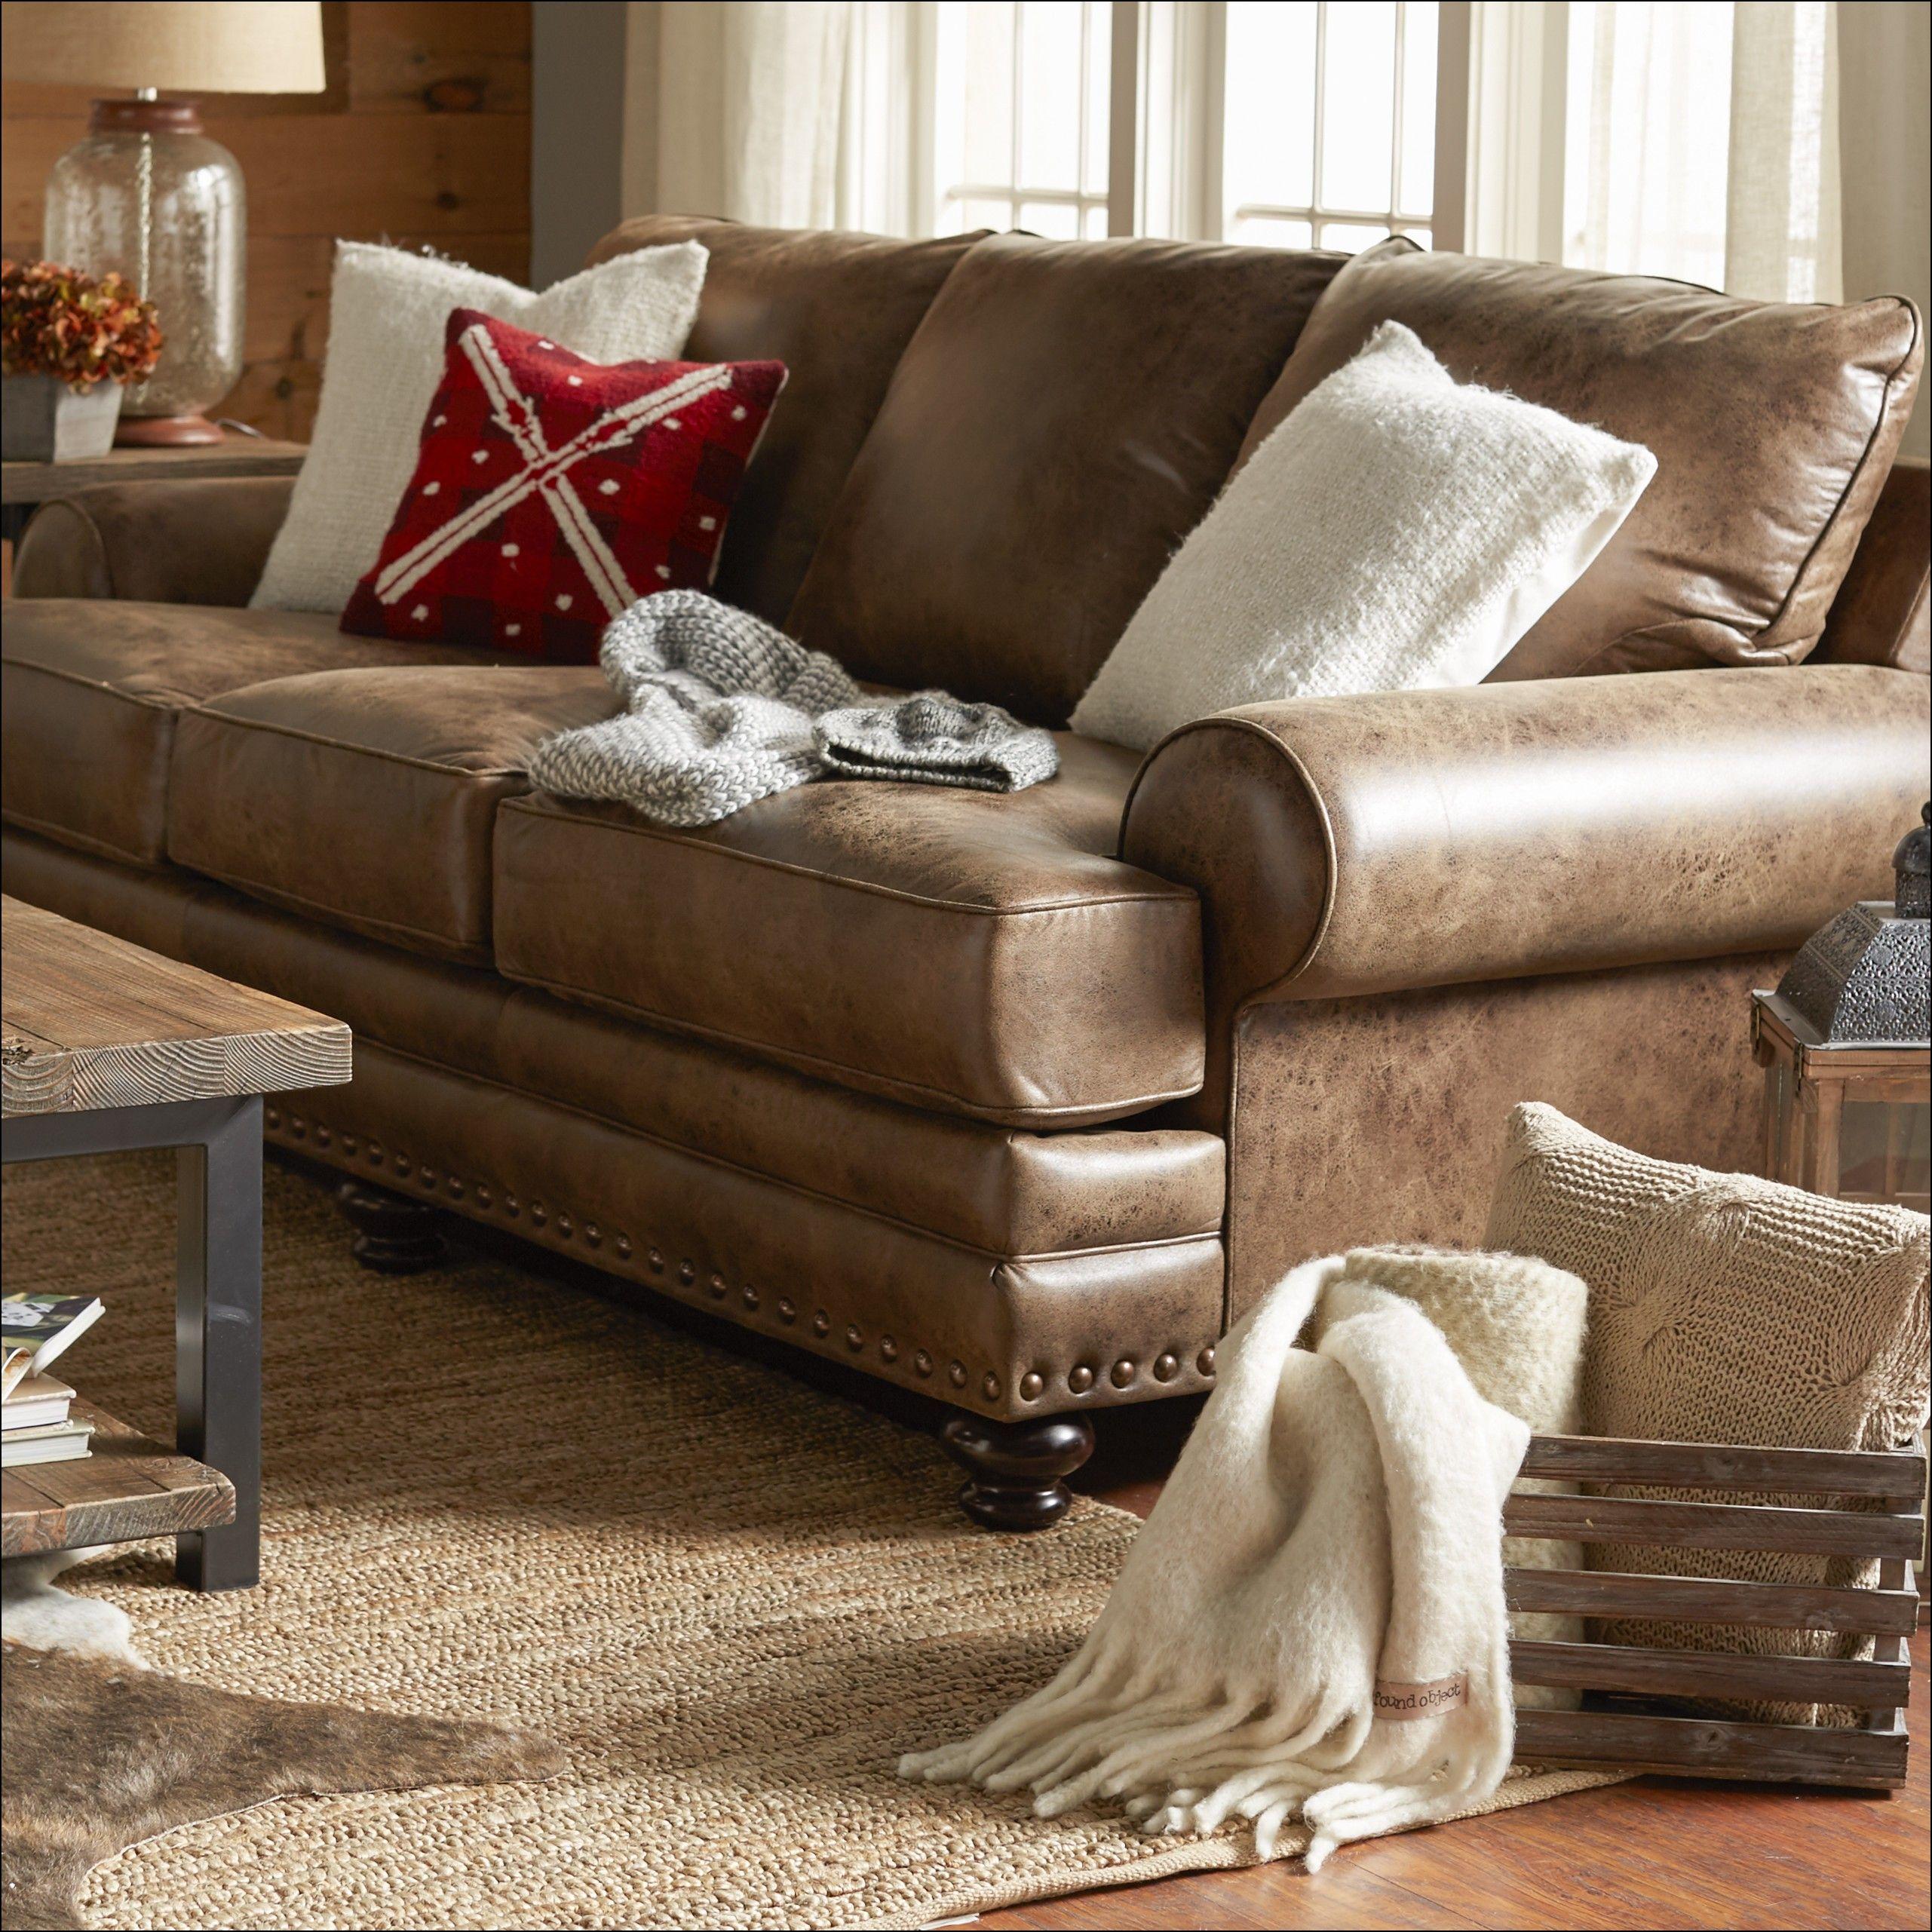 Sofa without Fire Retardant